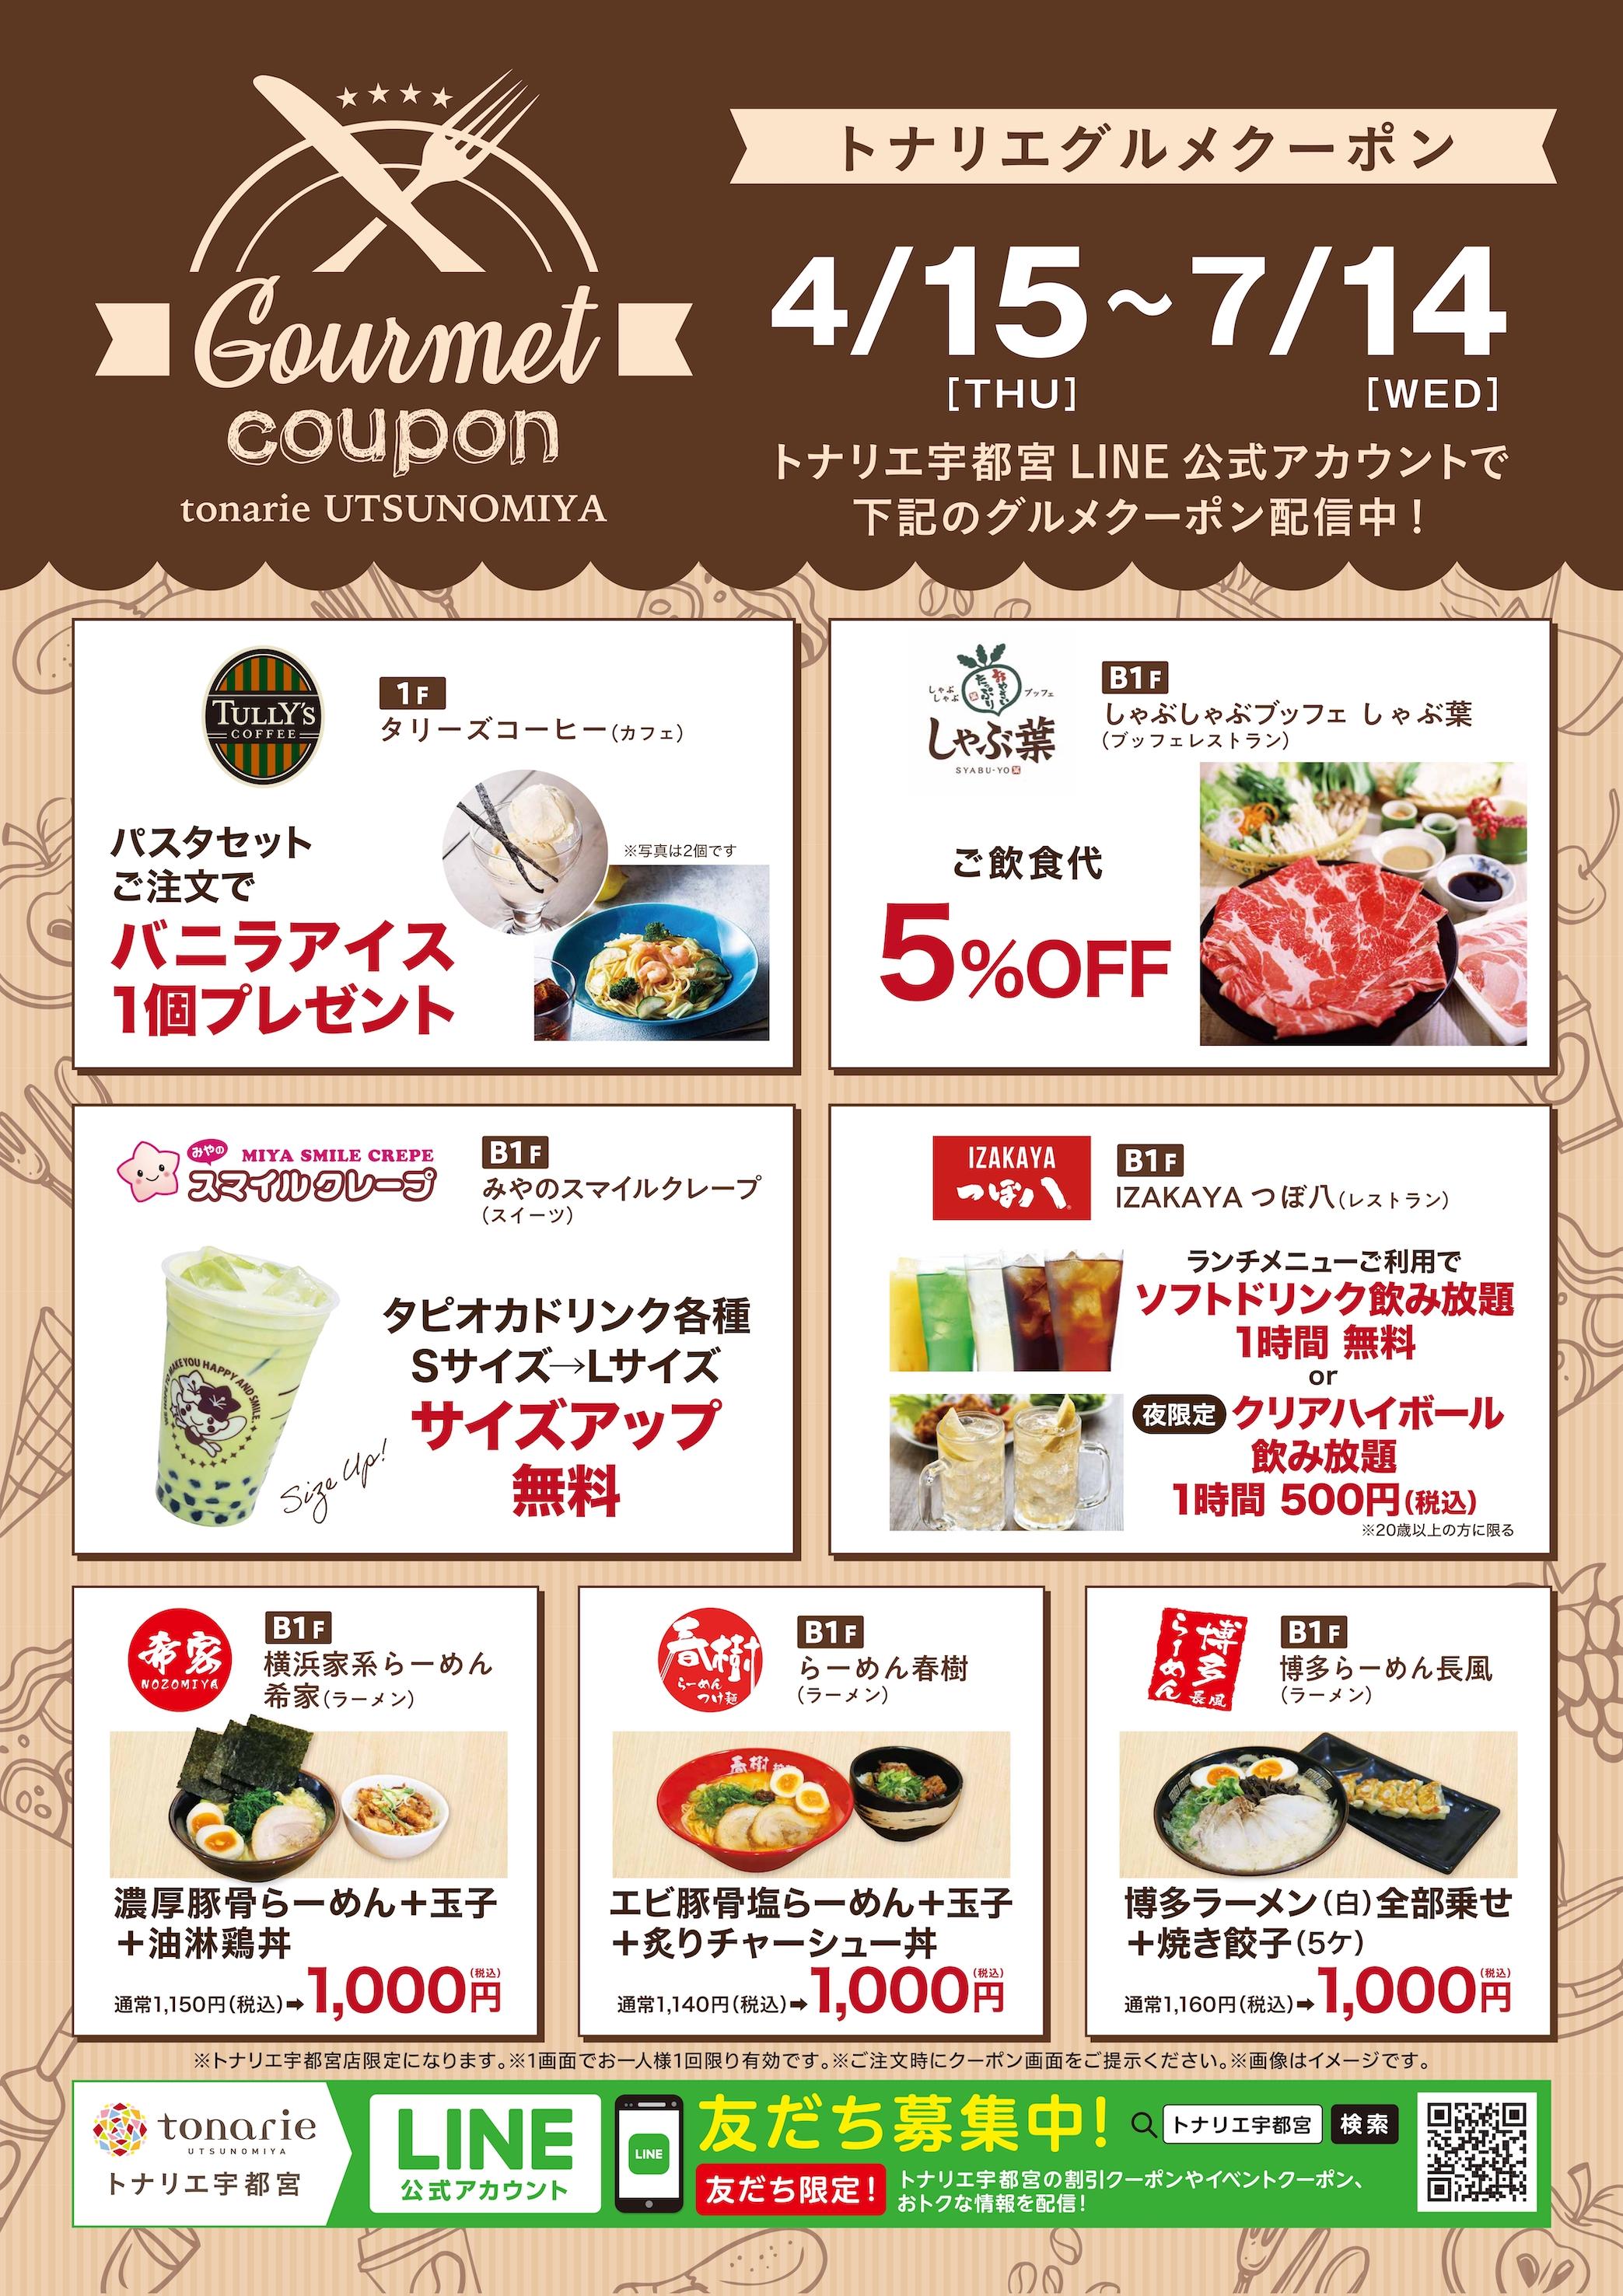 LINE公式アカウント「選べるグルメクーポン」配信中!